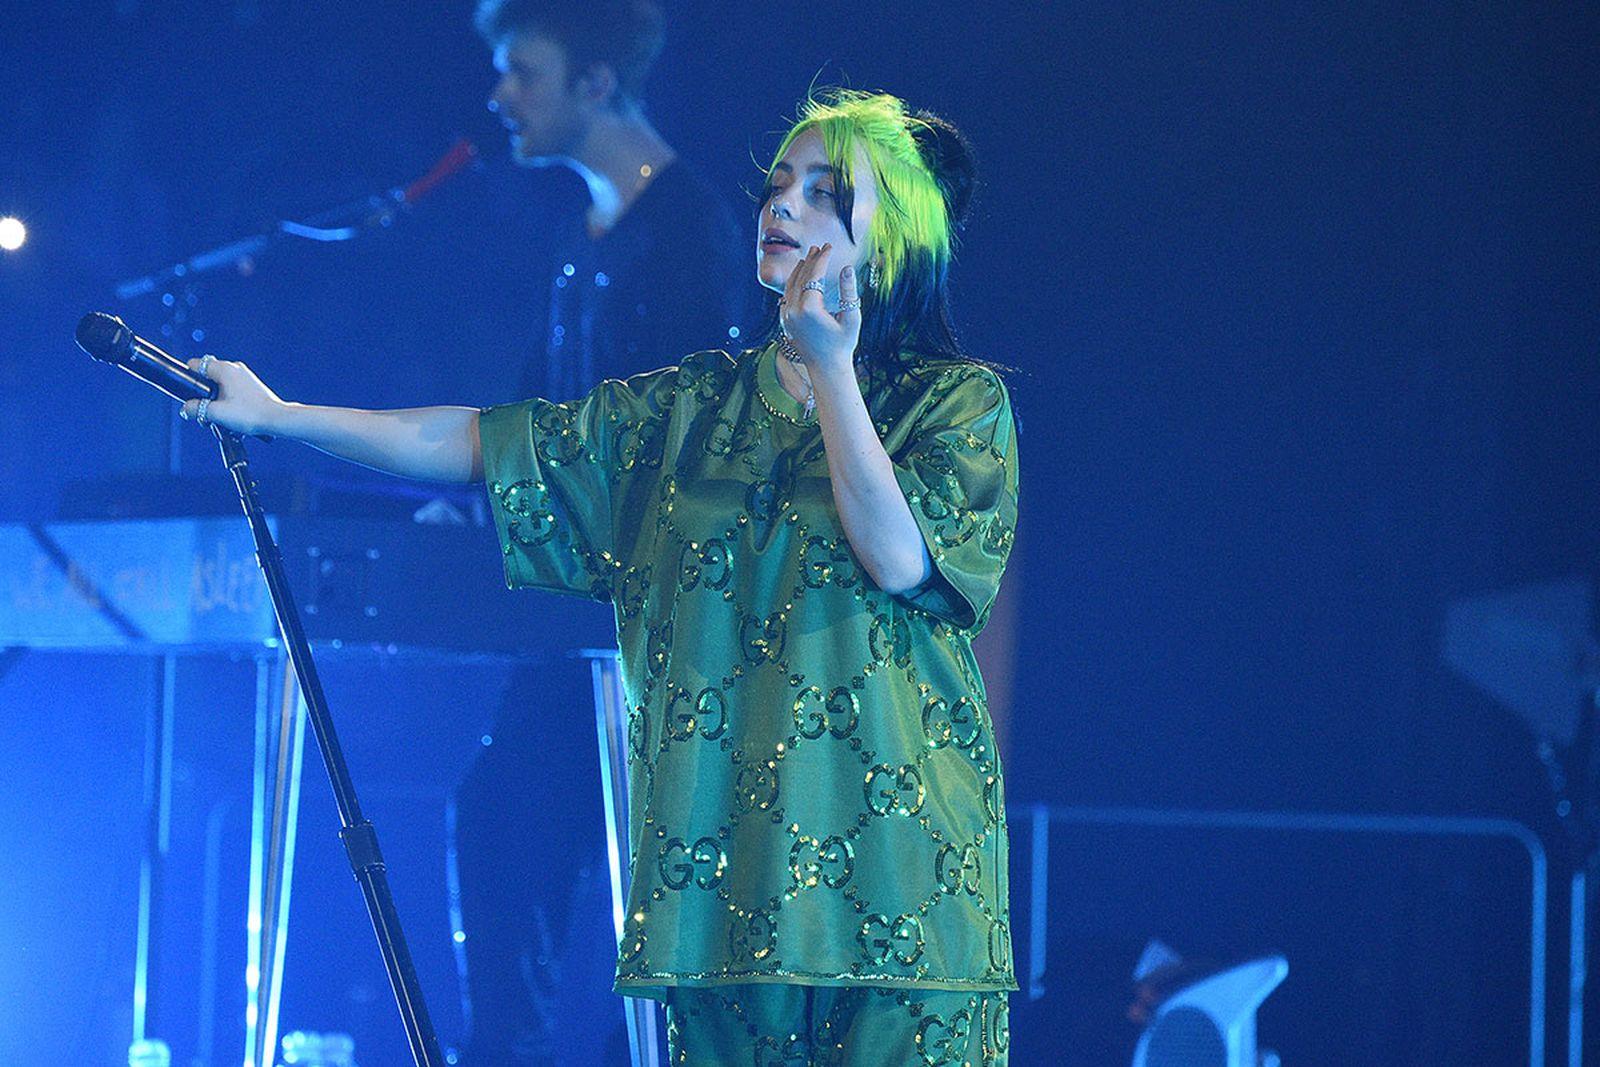 Billie Eilish performs live on stage